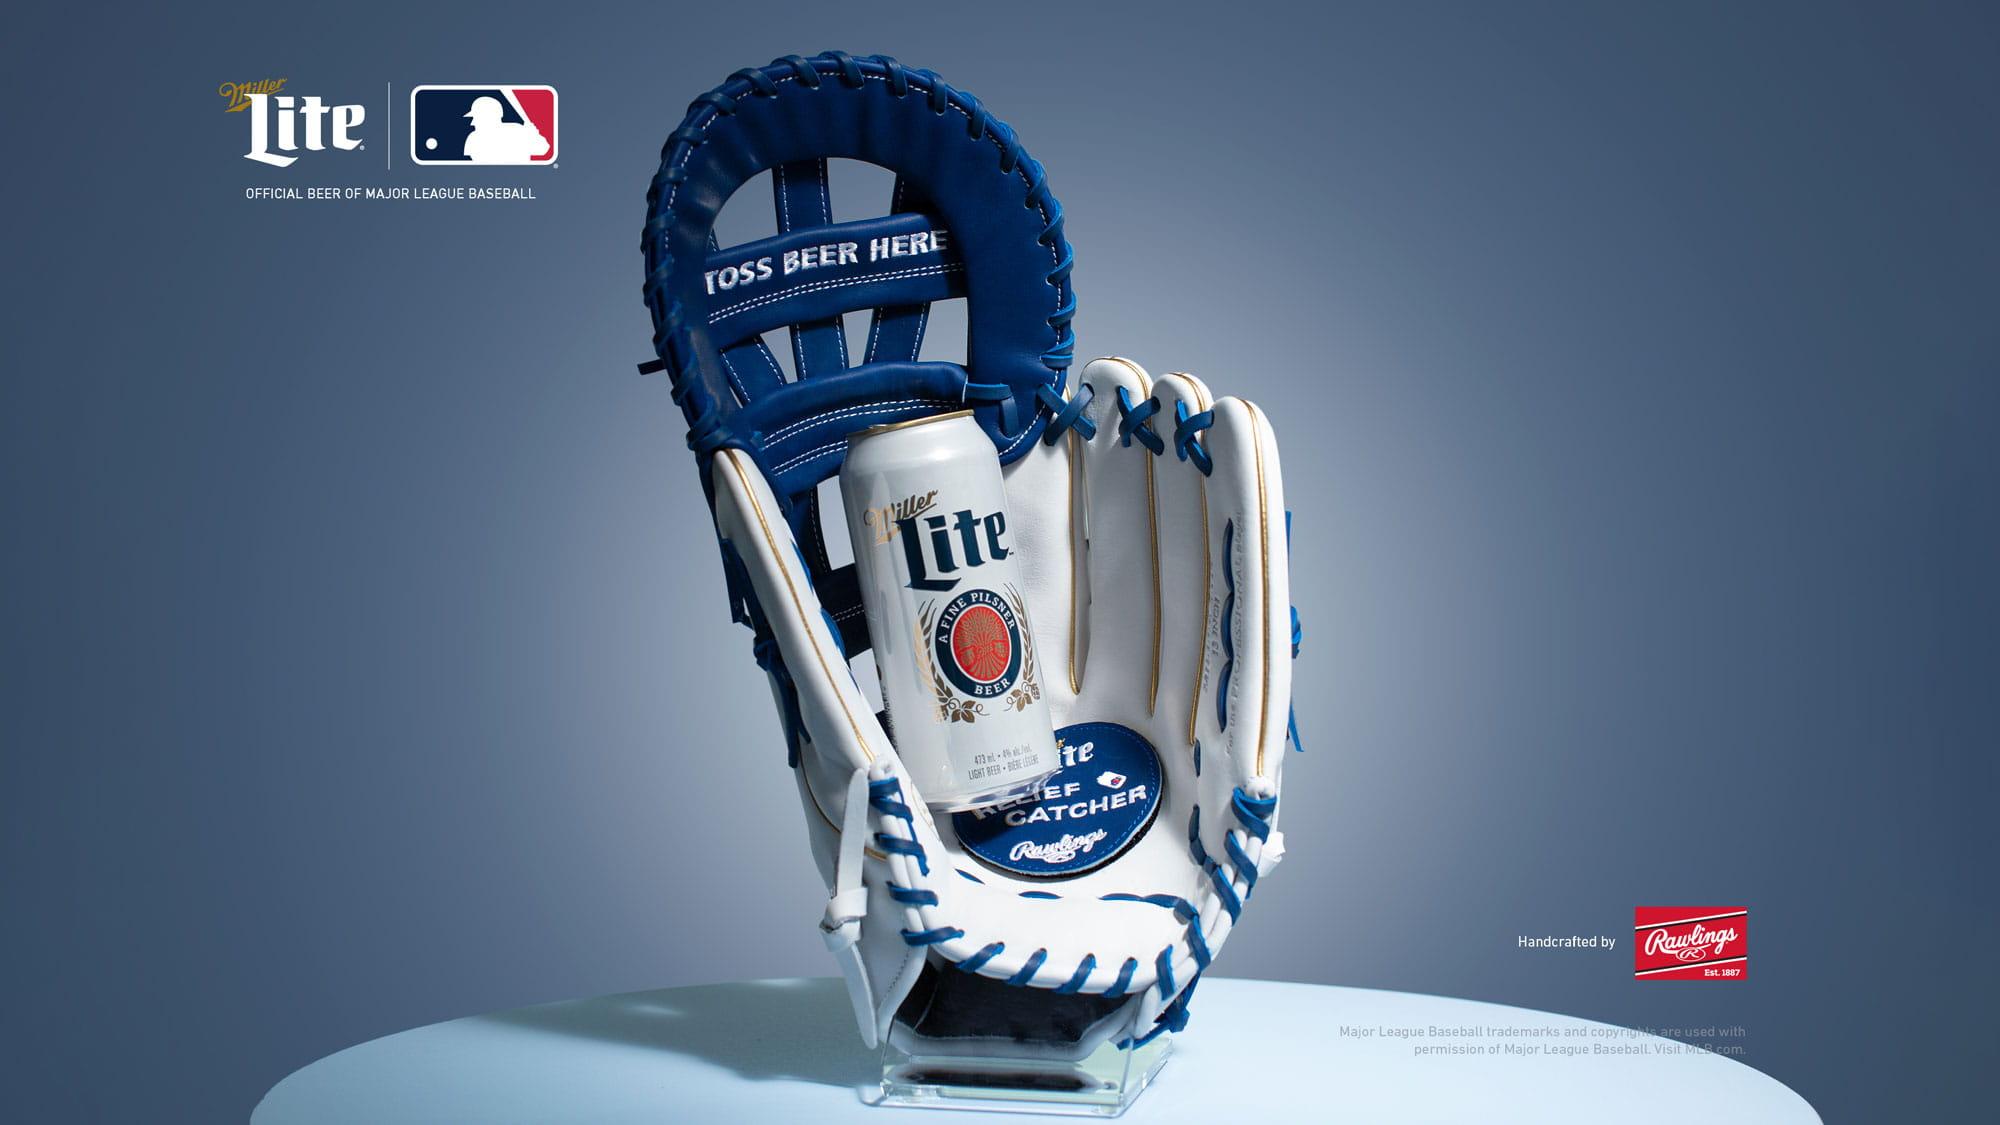 Miller Lite baseball glove with beer can inside